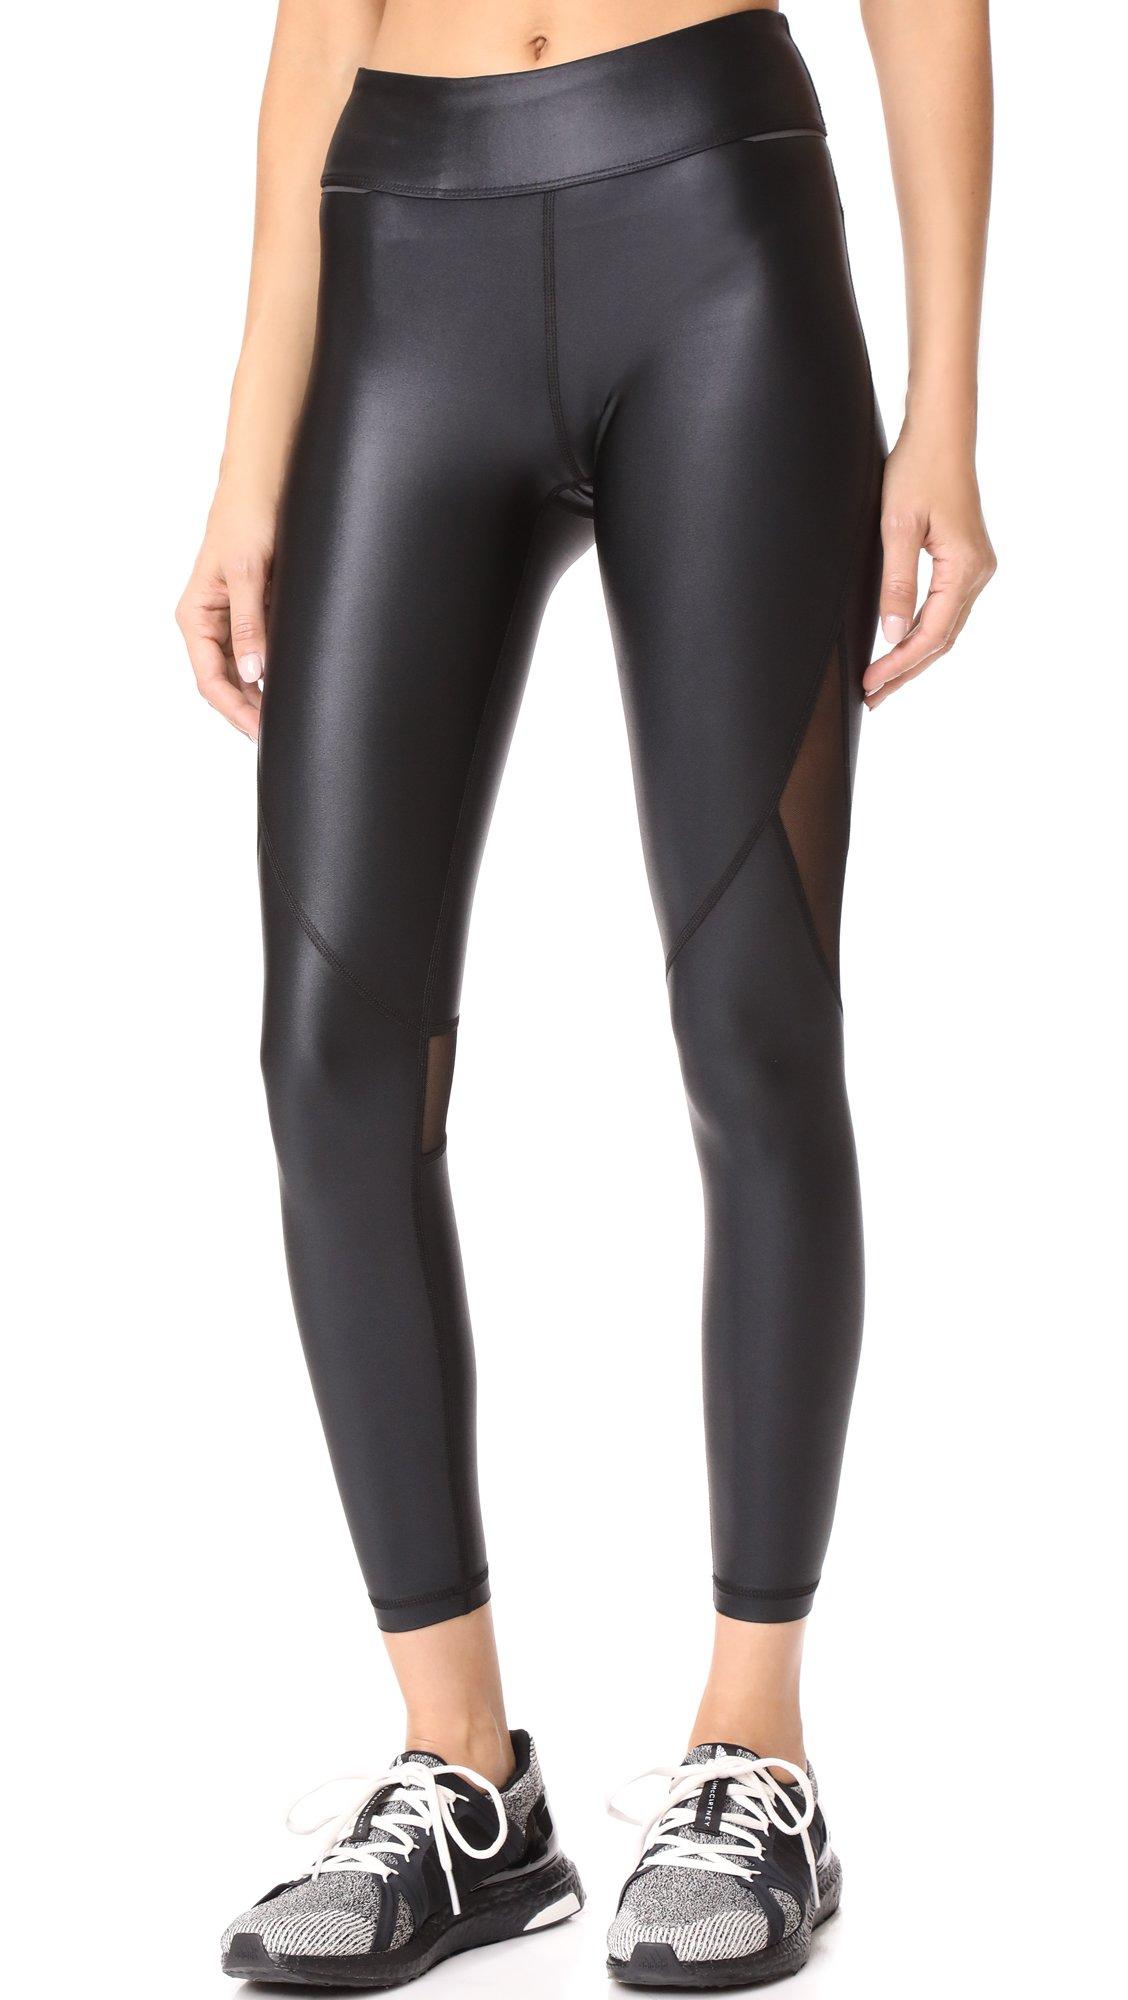 ALALA Women's Captain Ankle Leggings, Black/Liquid Black, Large